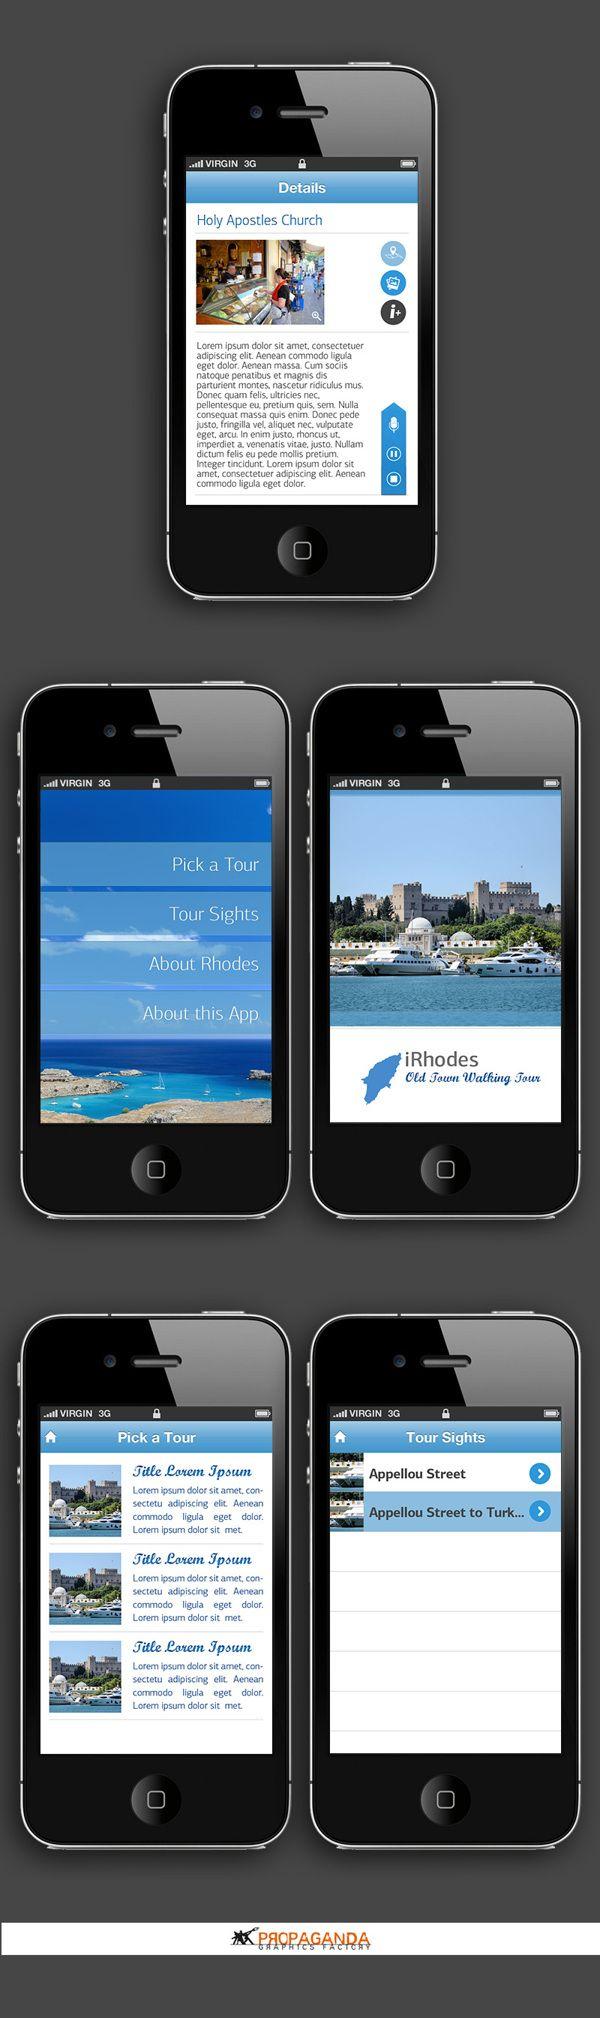 iRhodes - iPhone application • UI/UX by Propaganda Graphics Factory , via Behance #propaganda_apps #iphone #propagandagf #ui #ux #mobileapp #graphicdesign